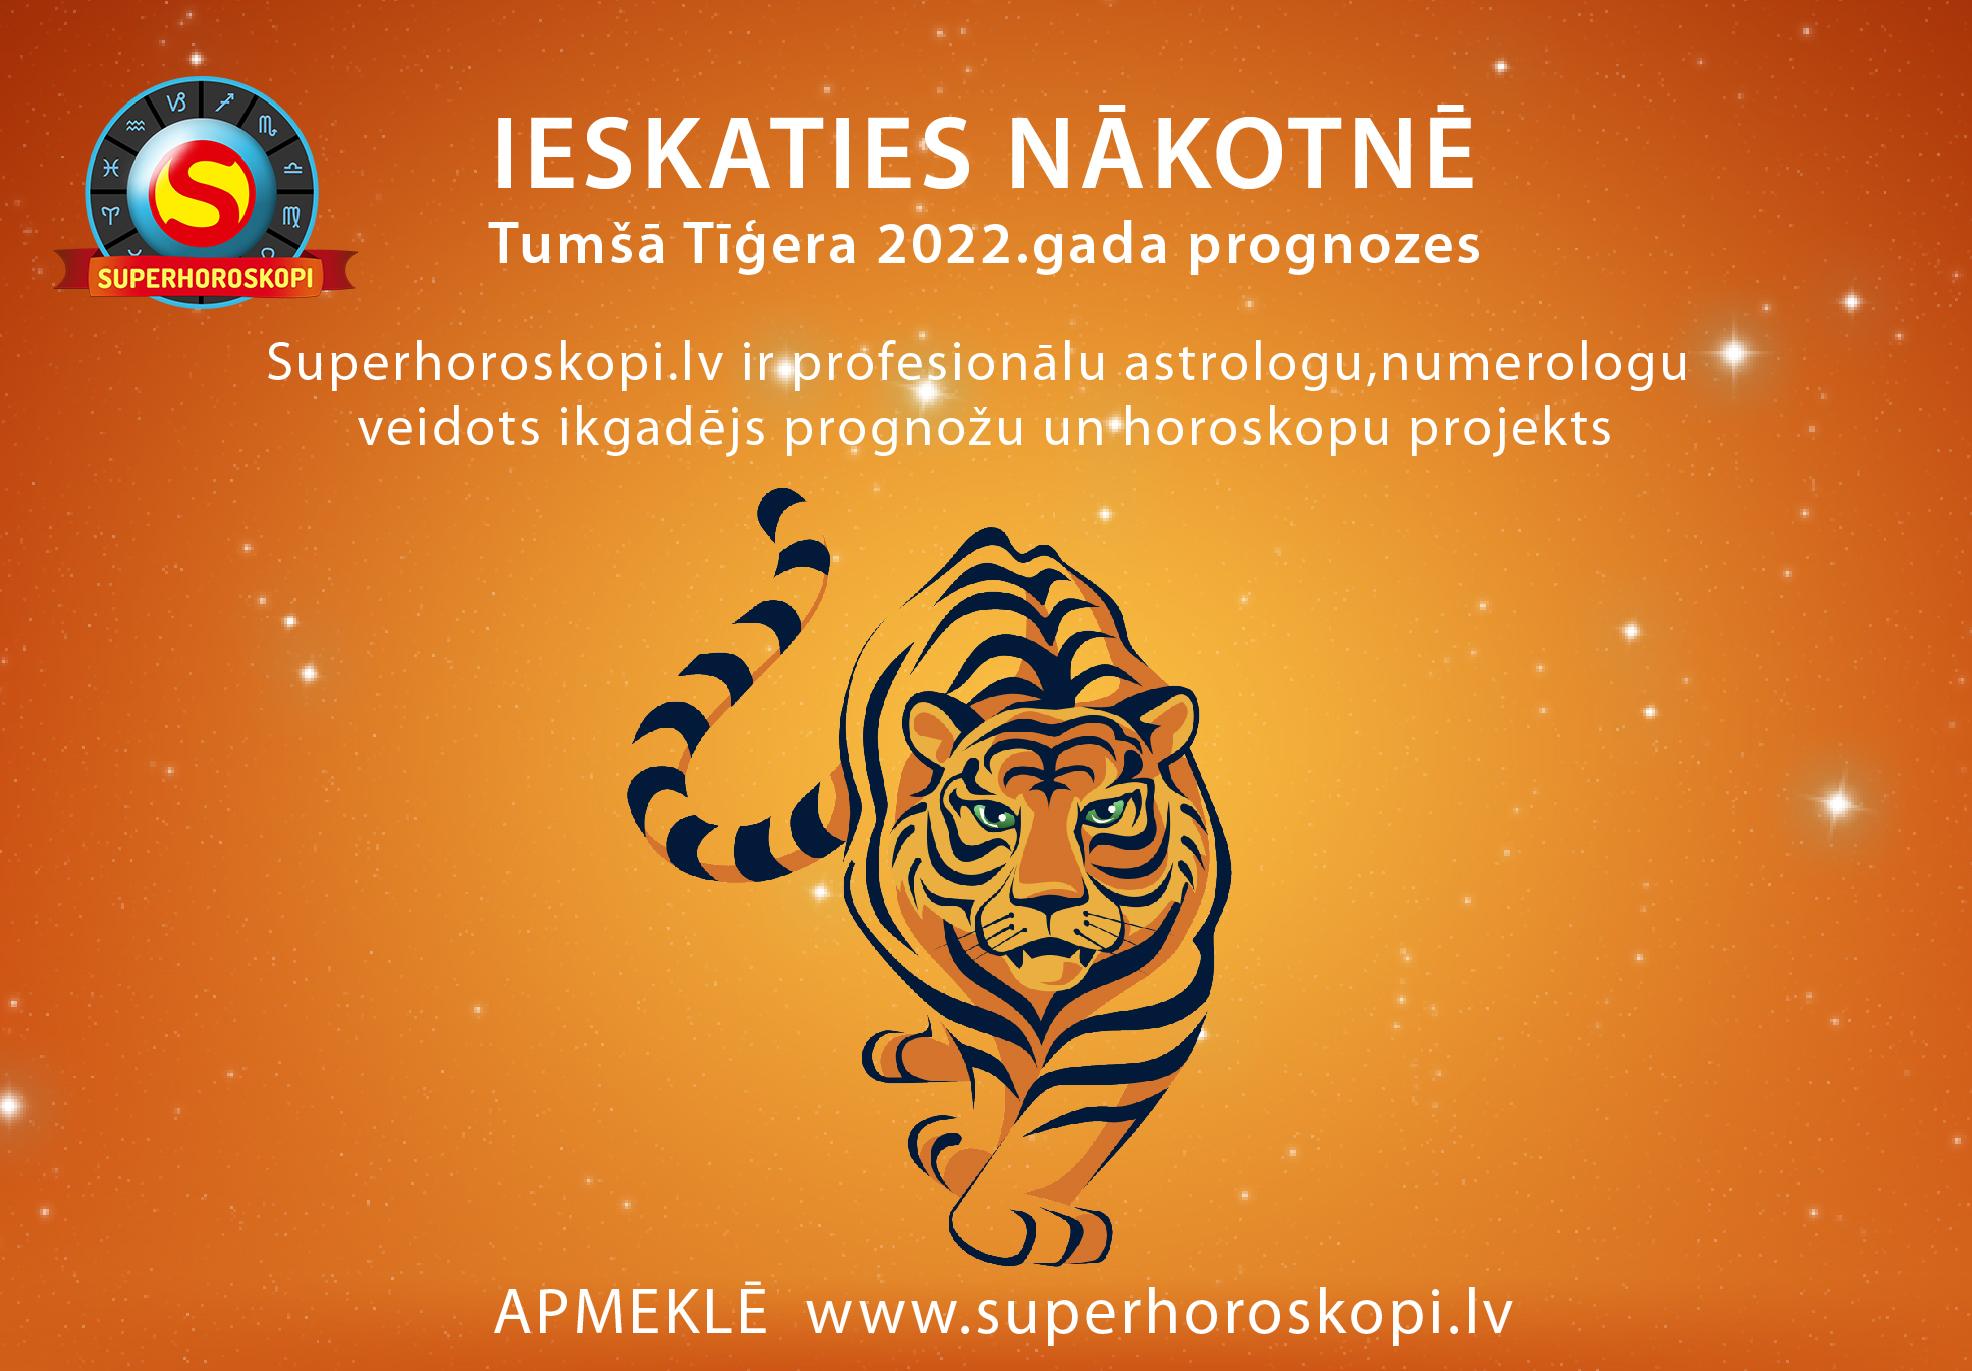 superhoroskopi_reklamas_tigeris_03.jpg